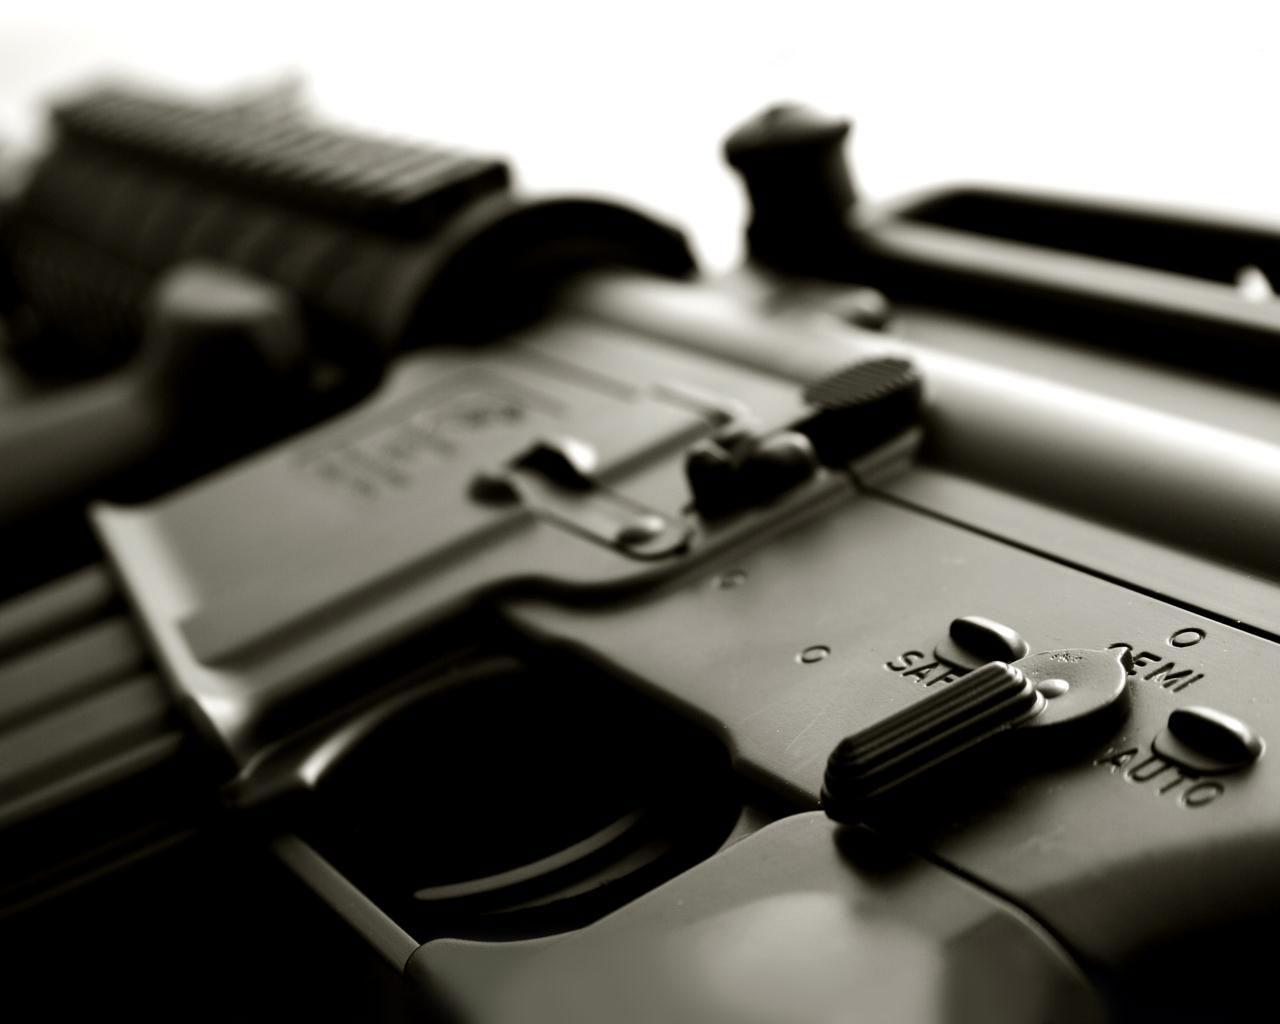 All Guns In The World Wallpaper